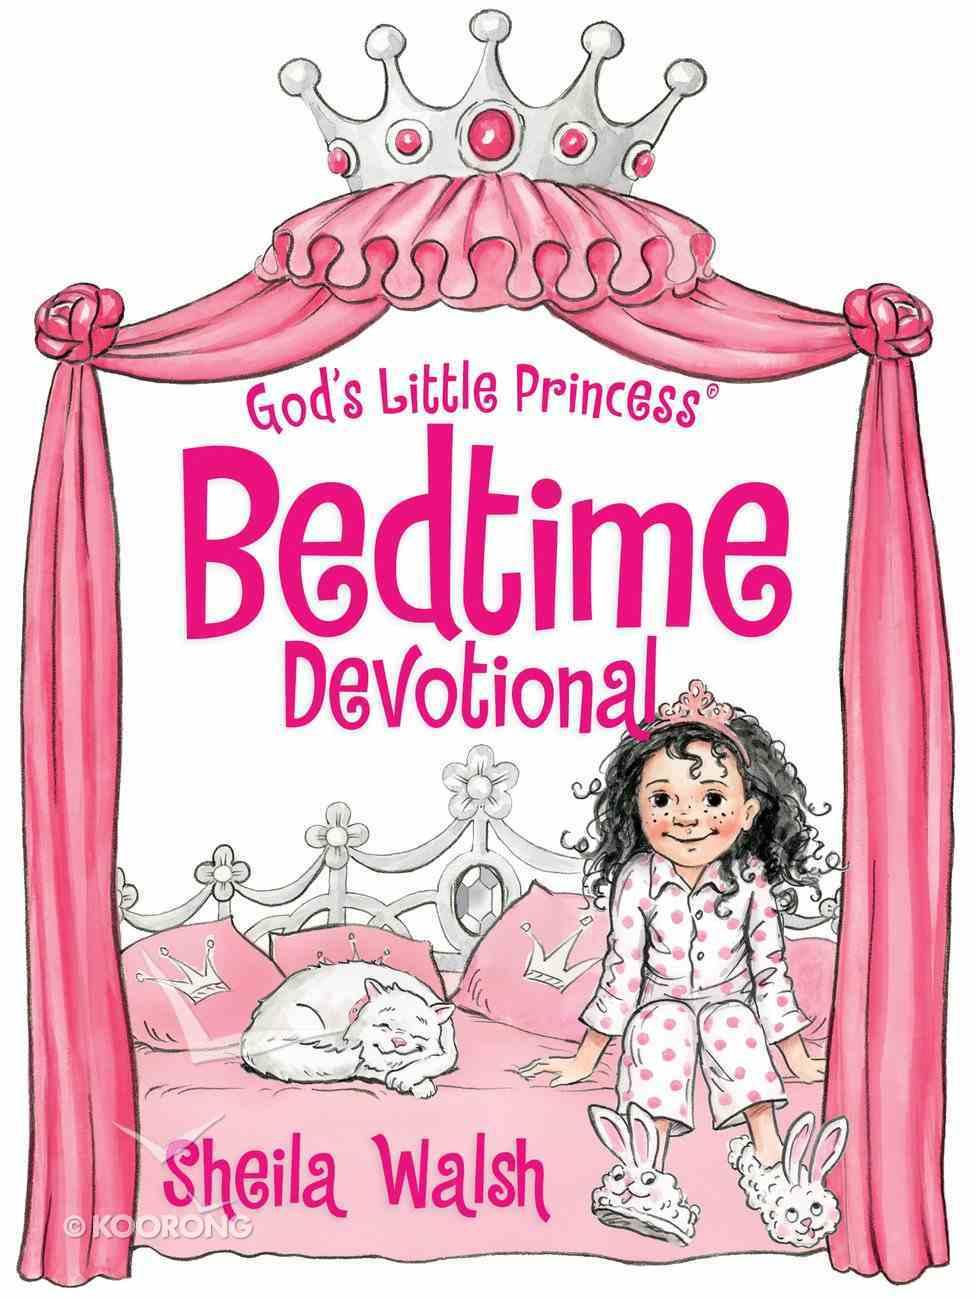 God's Little Princess Bedtime Devotional (Gigi, God's Little Princess Series) eBook